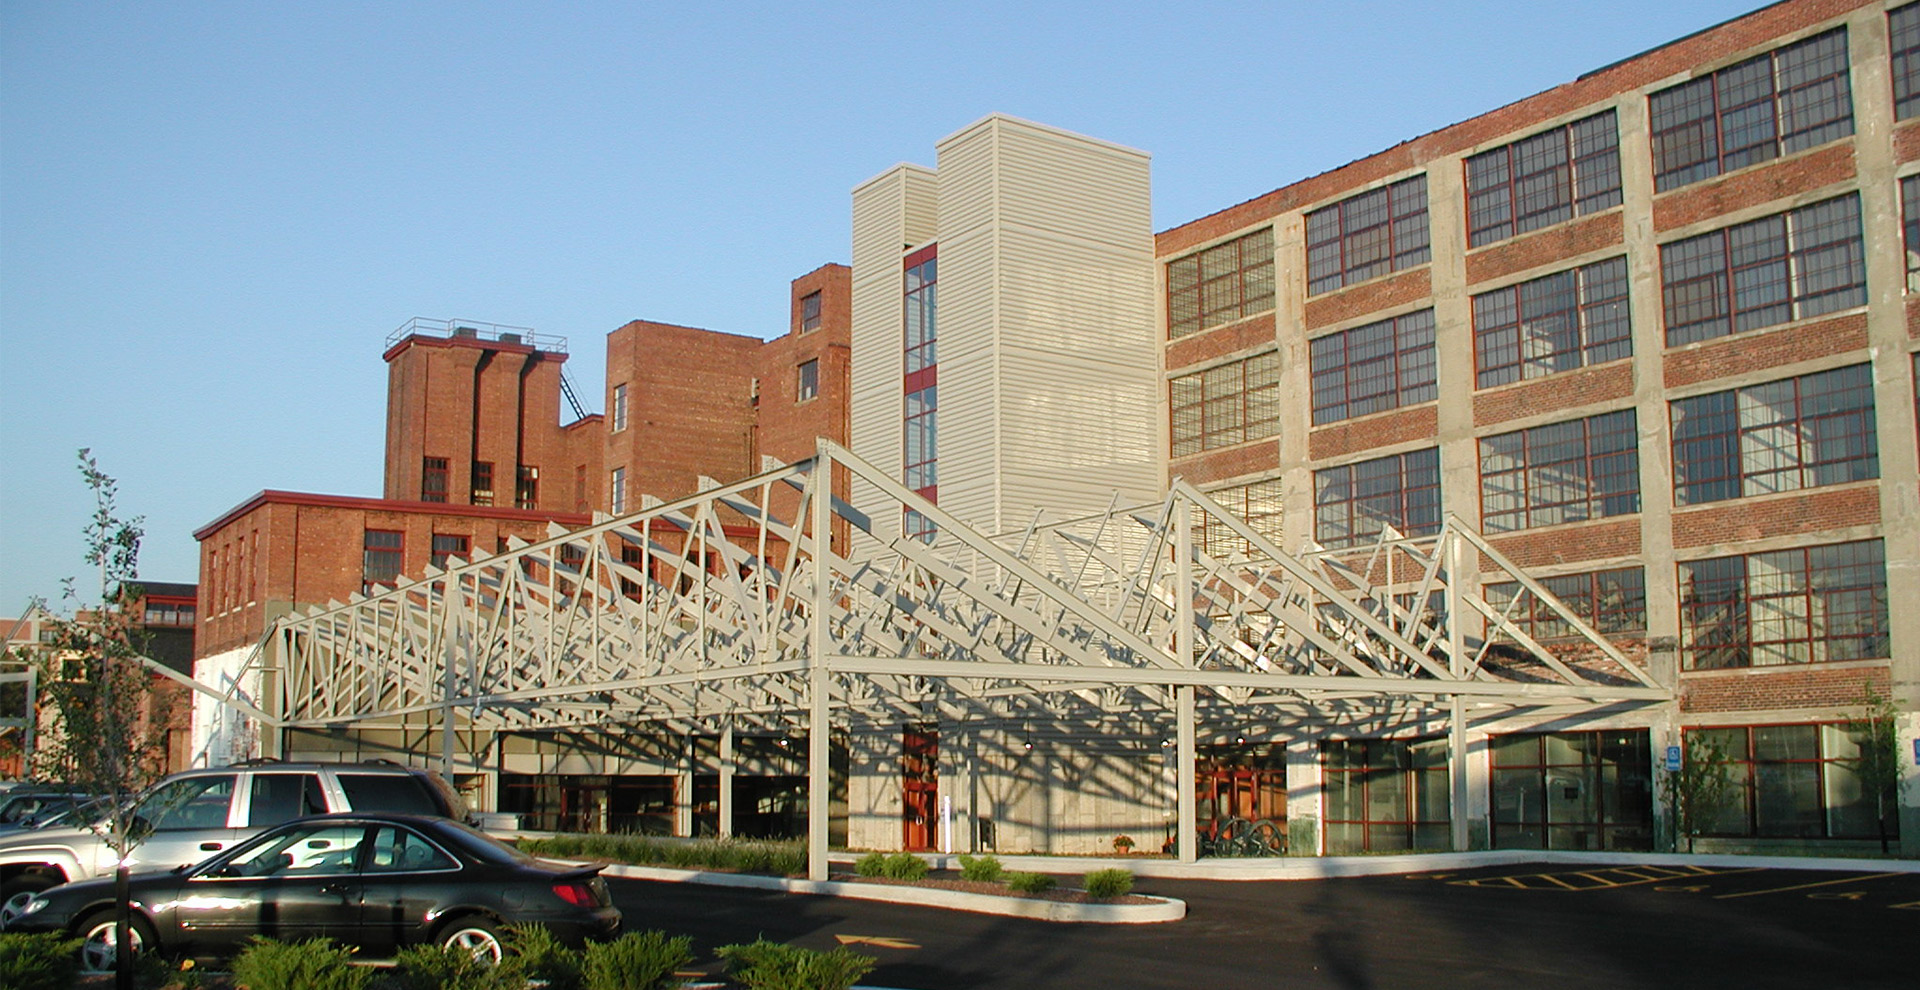 MCK Building Associates Lofts at Franklin Square